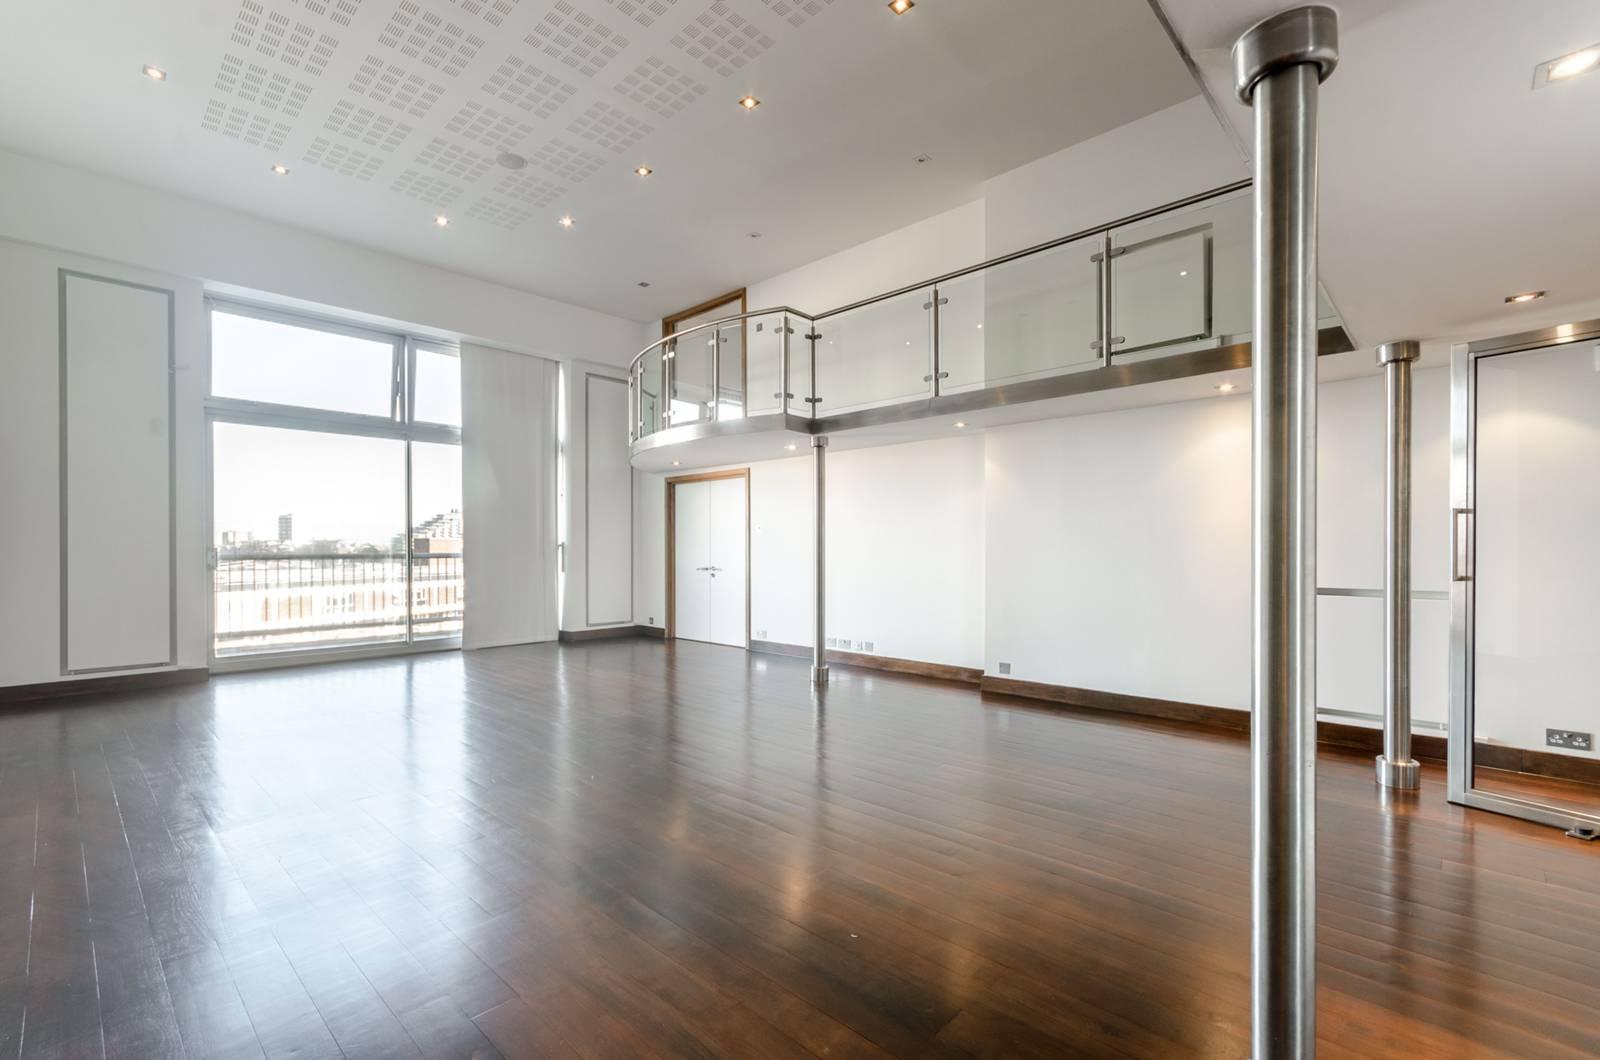 warehouse conversion,Lounge